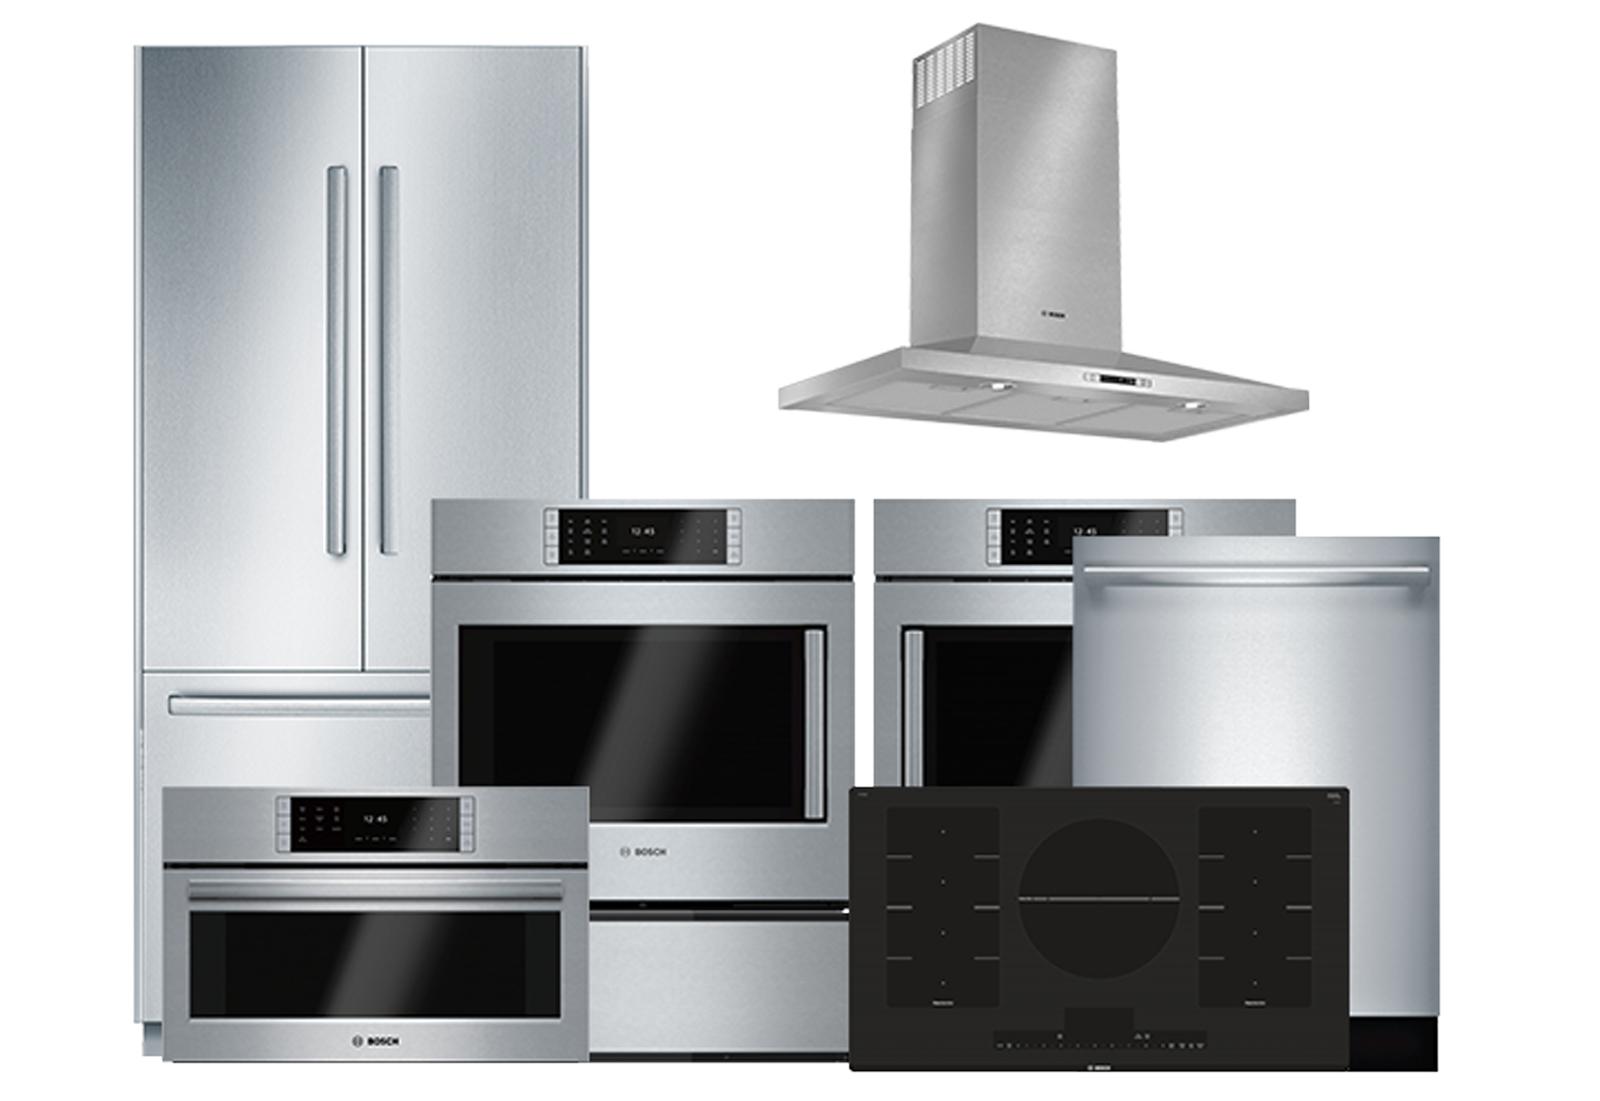 Bosch Save 15 Percent Zeglin S Home Tv Appliance Inc